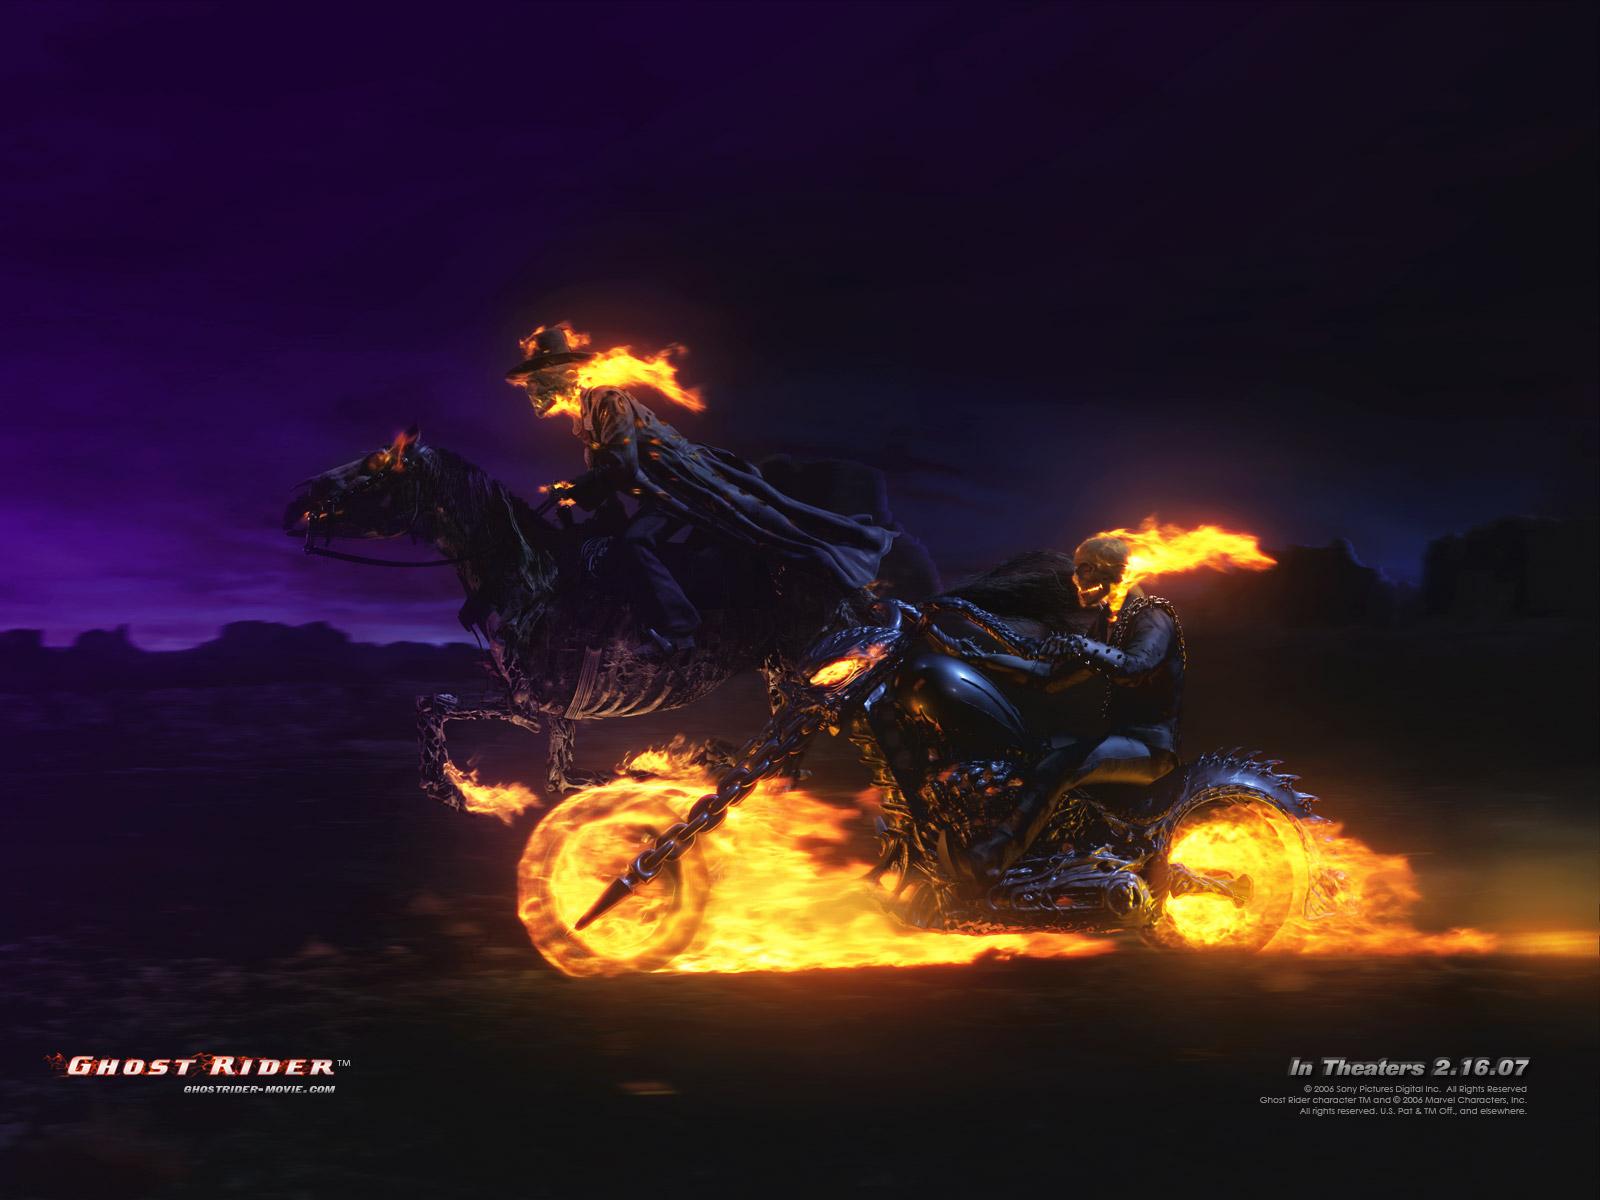 1600x1200 Ghost Rider desktop PC and Mac wallpaper 1600x1200